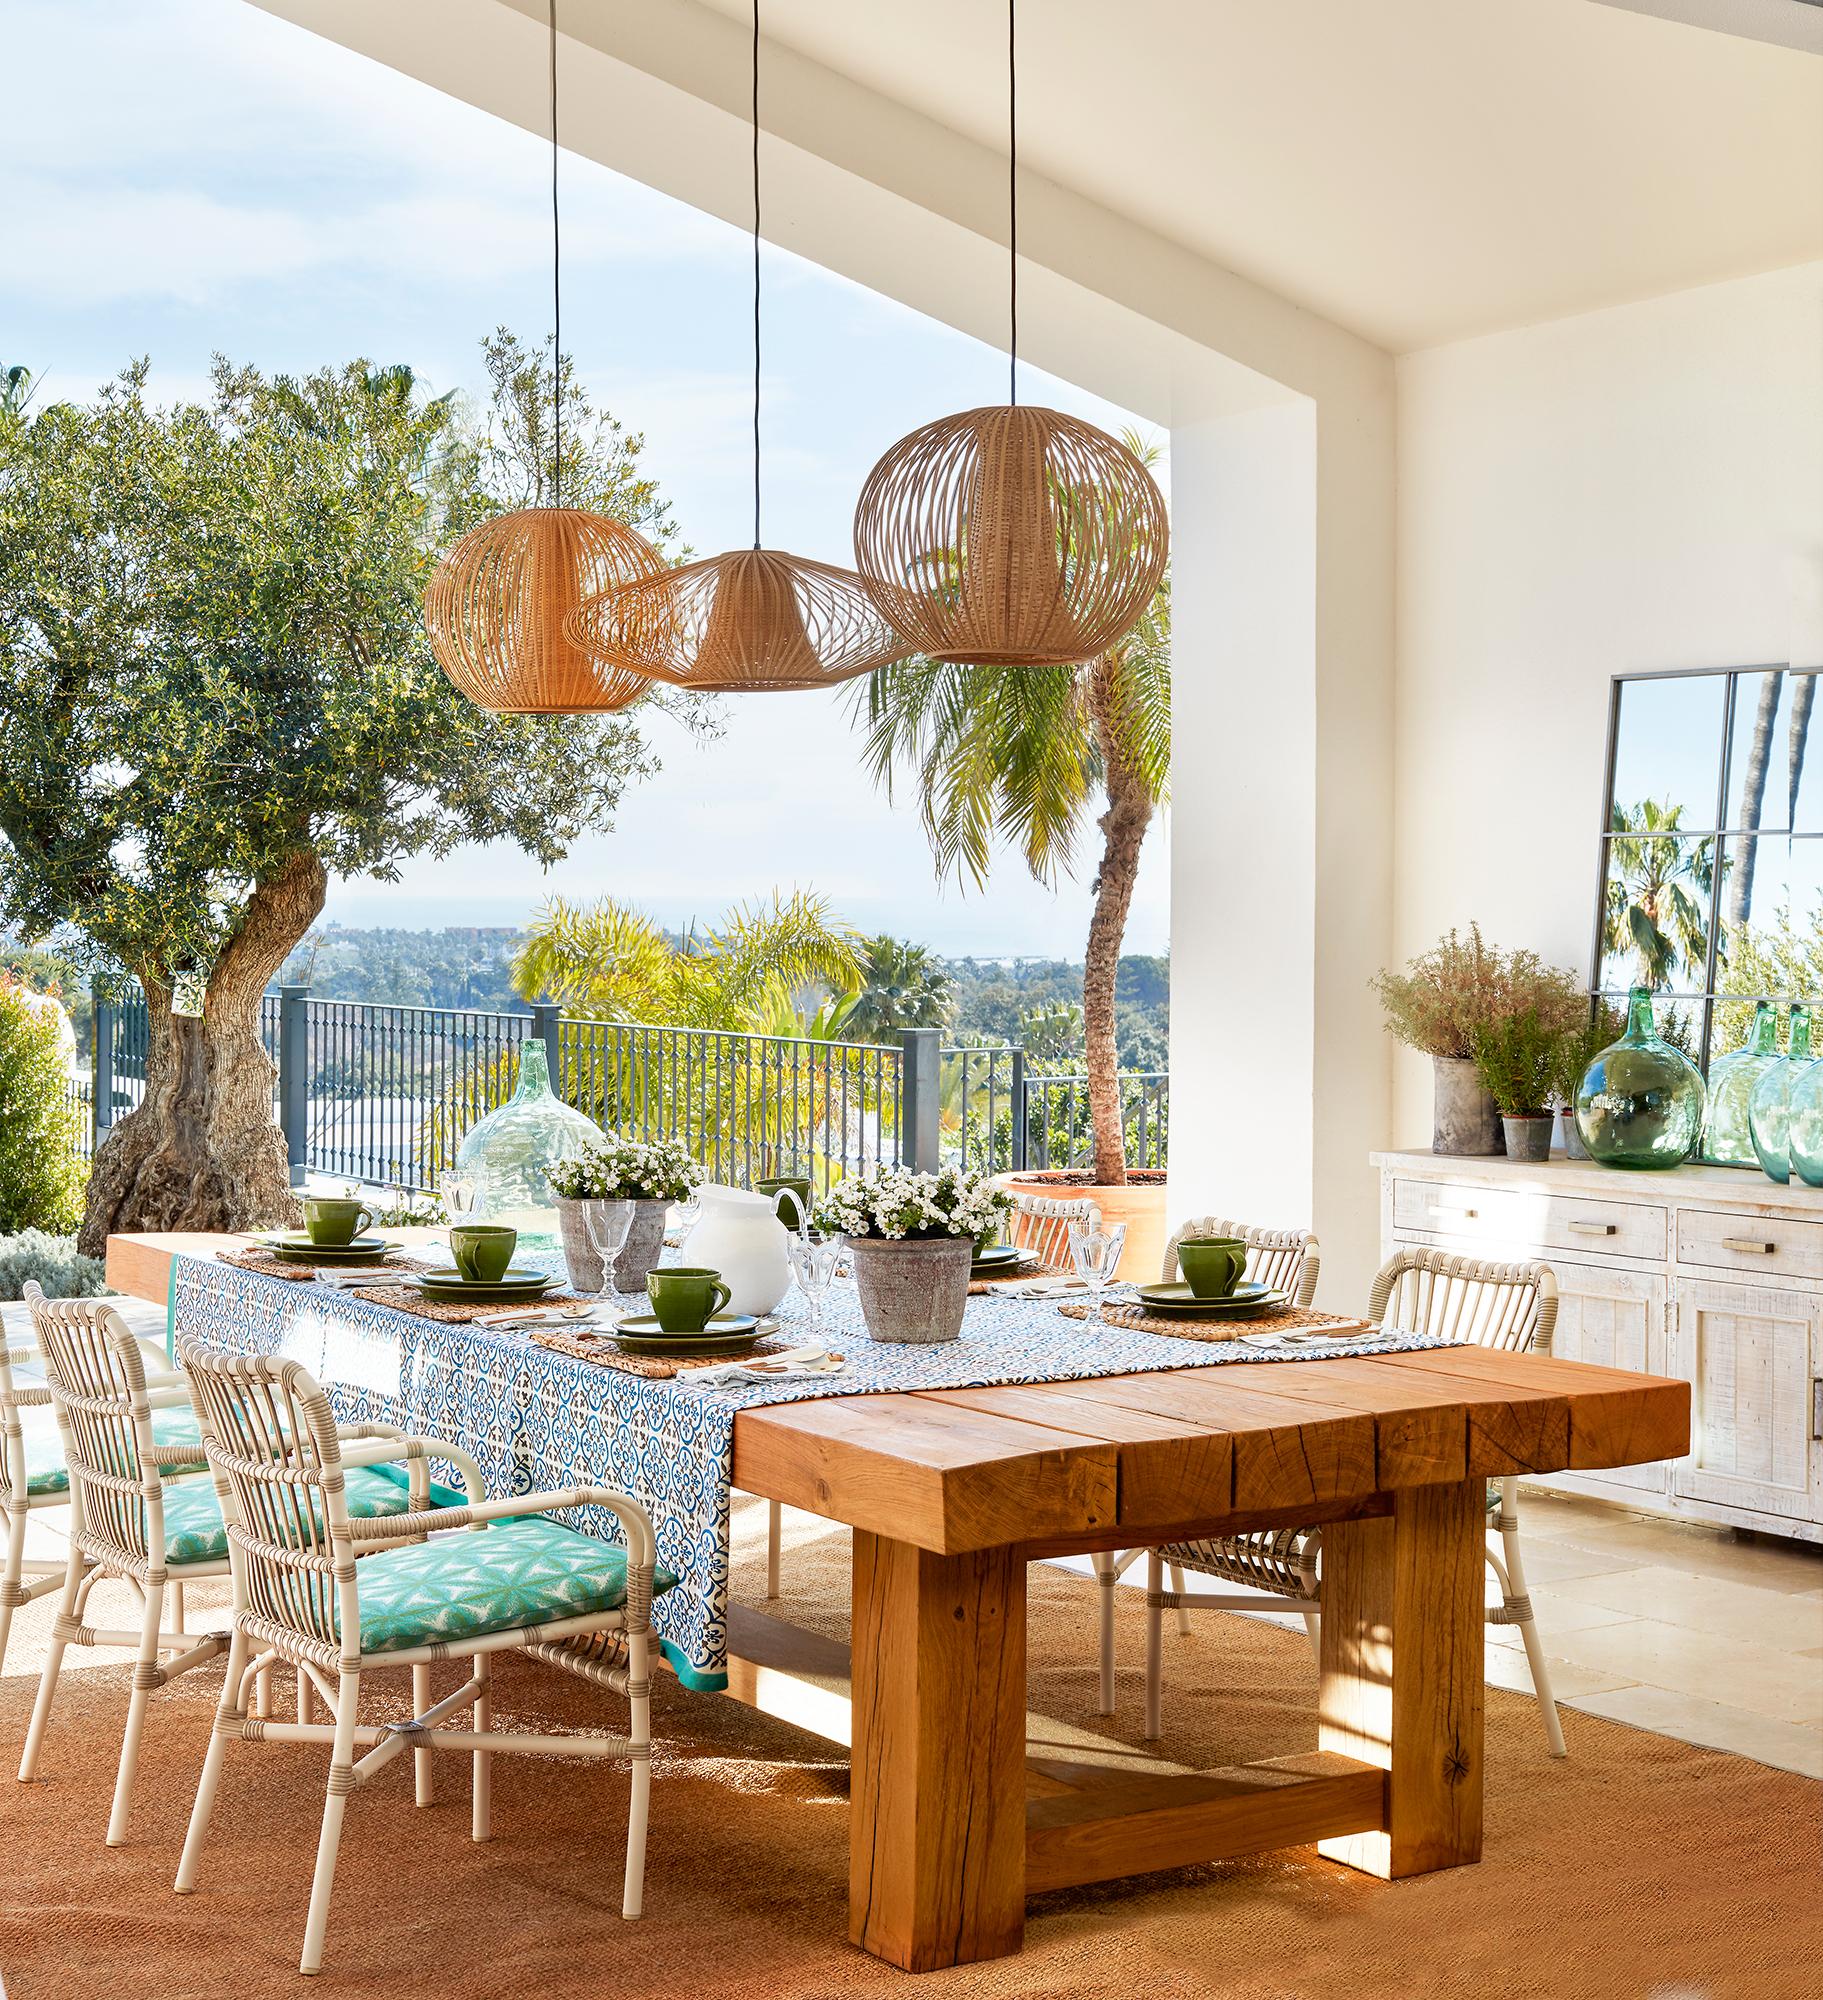 Comedores de exterior los 50 mejores de el mueble for Mesa cristal exterior